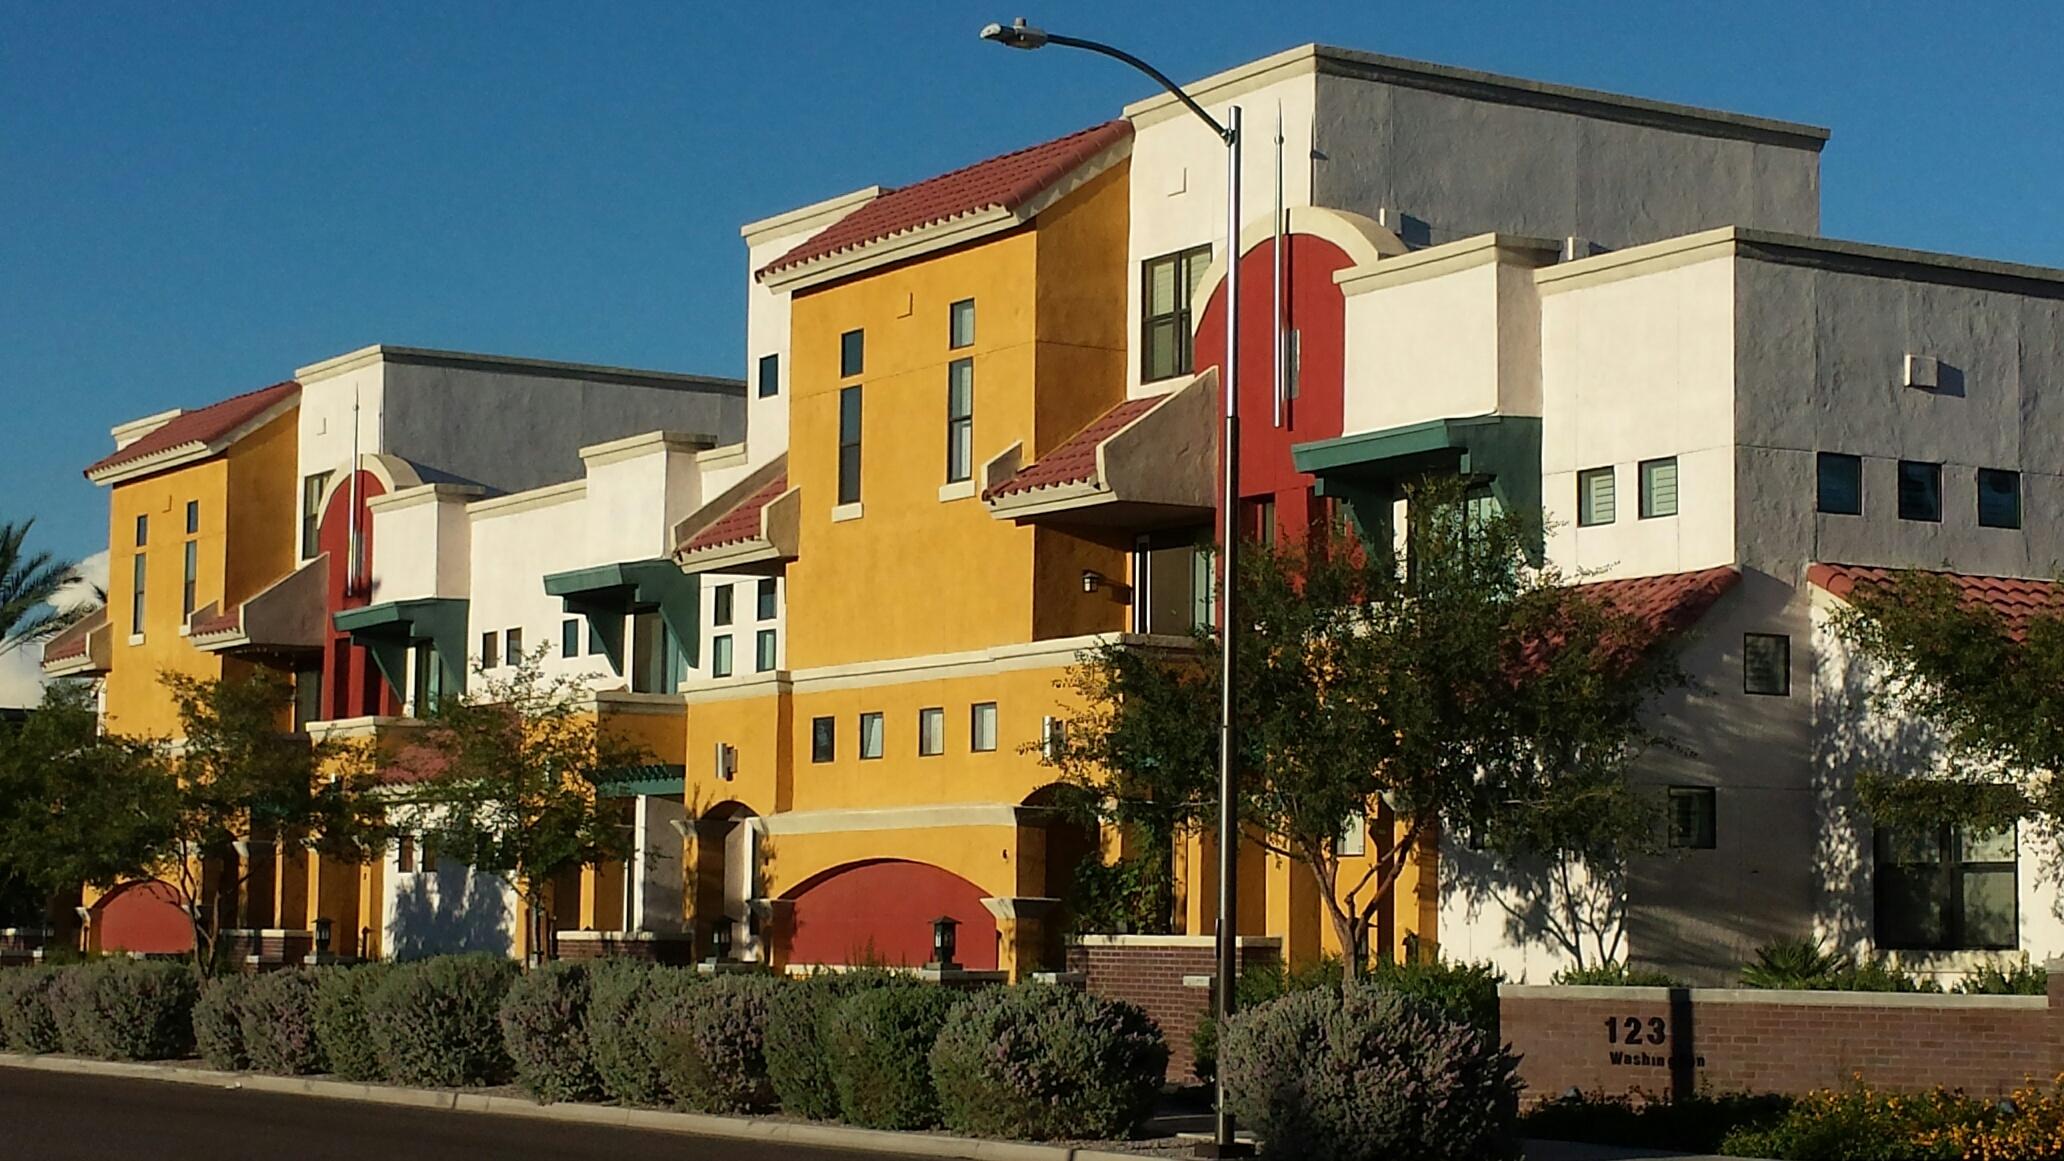 123 N Washington Condos in Downtown Chandler   Phoenix ...